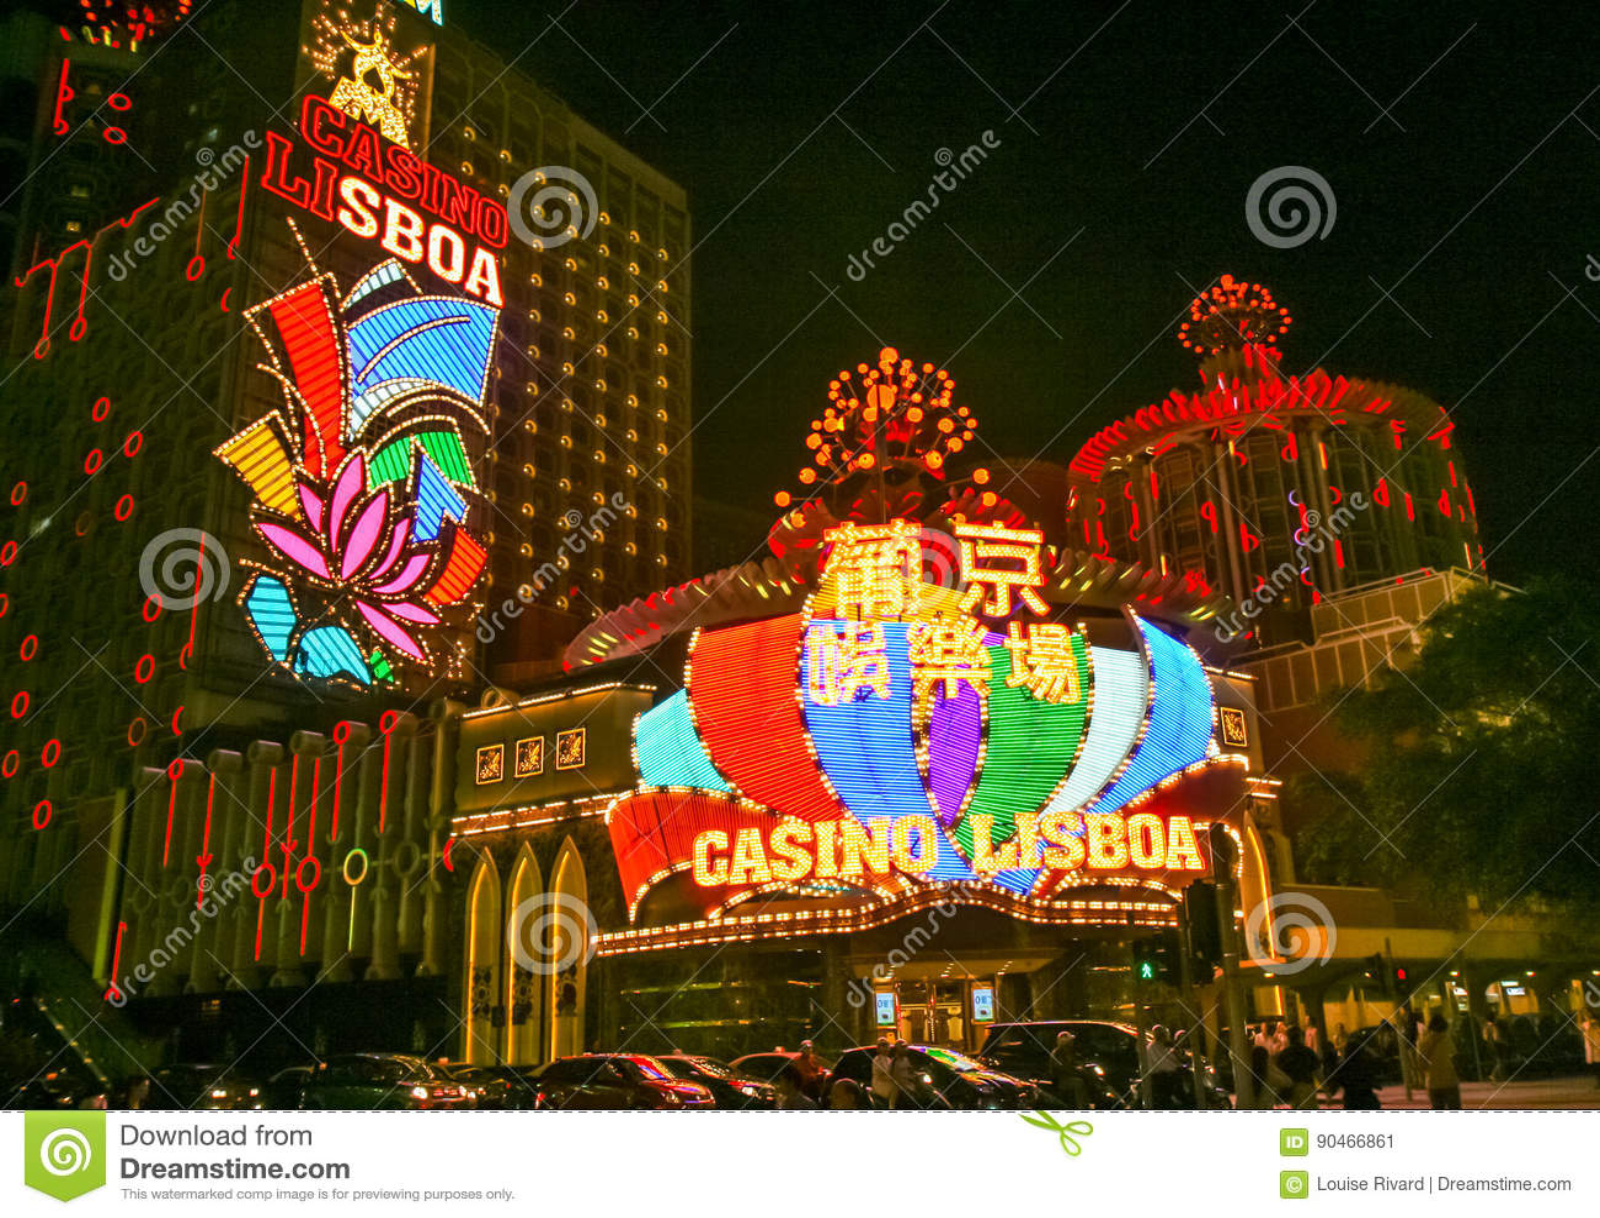 Casinos de Macao